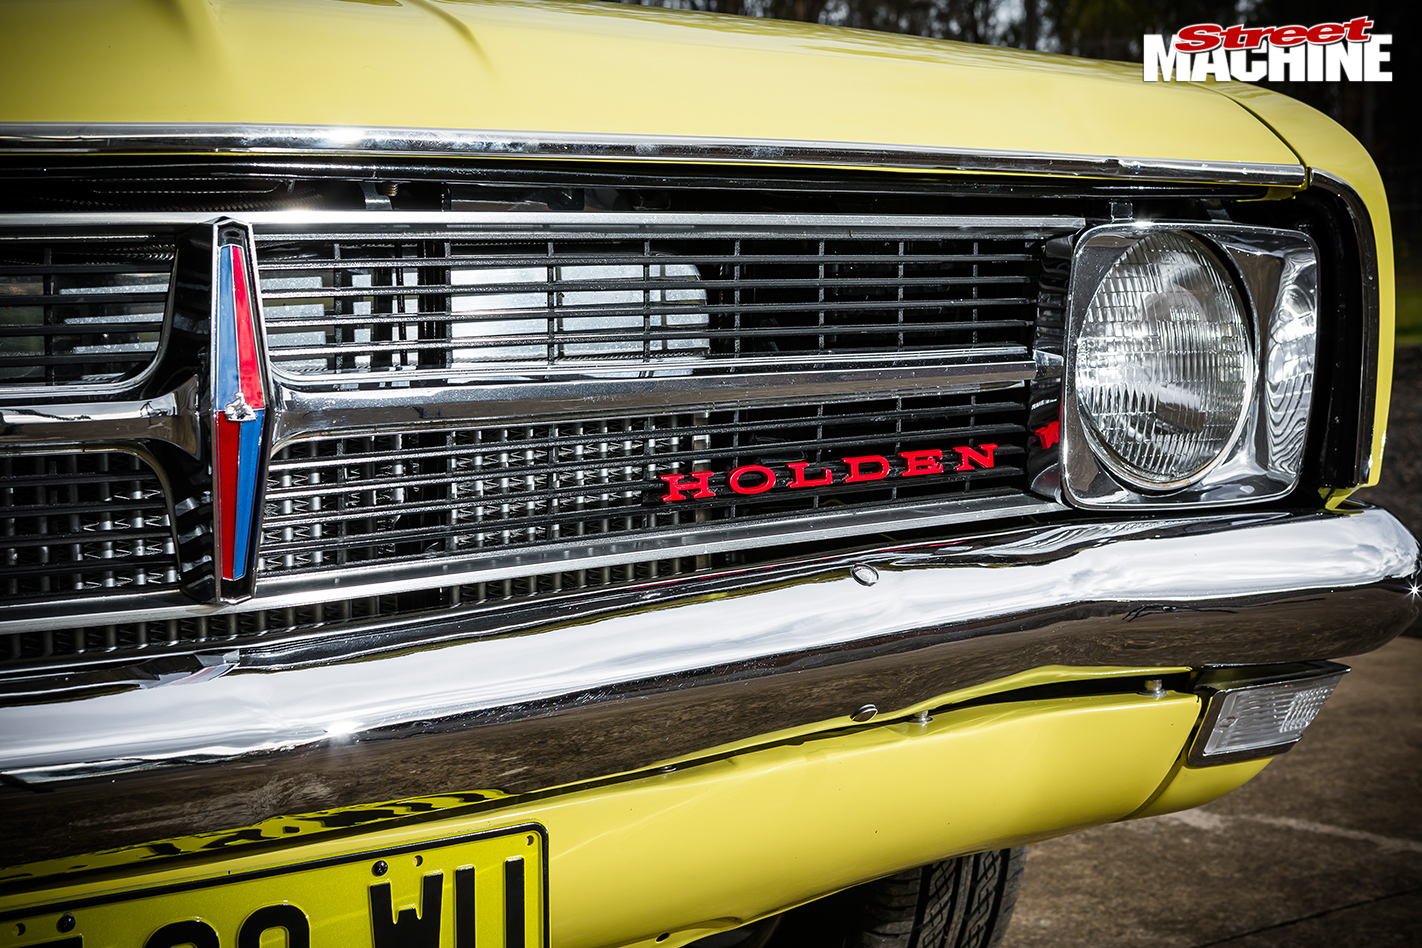 Holden -hk -monaro -front -grille